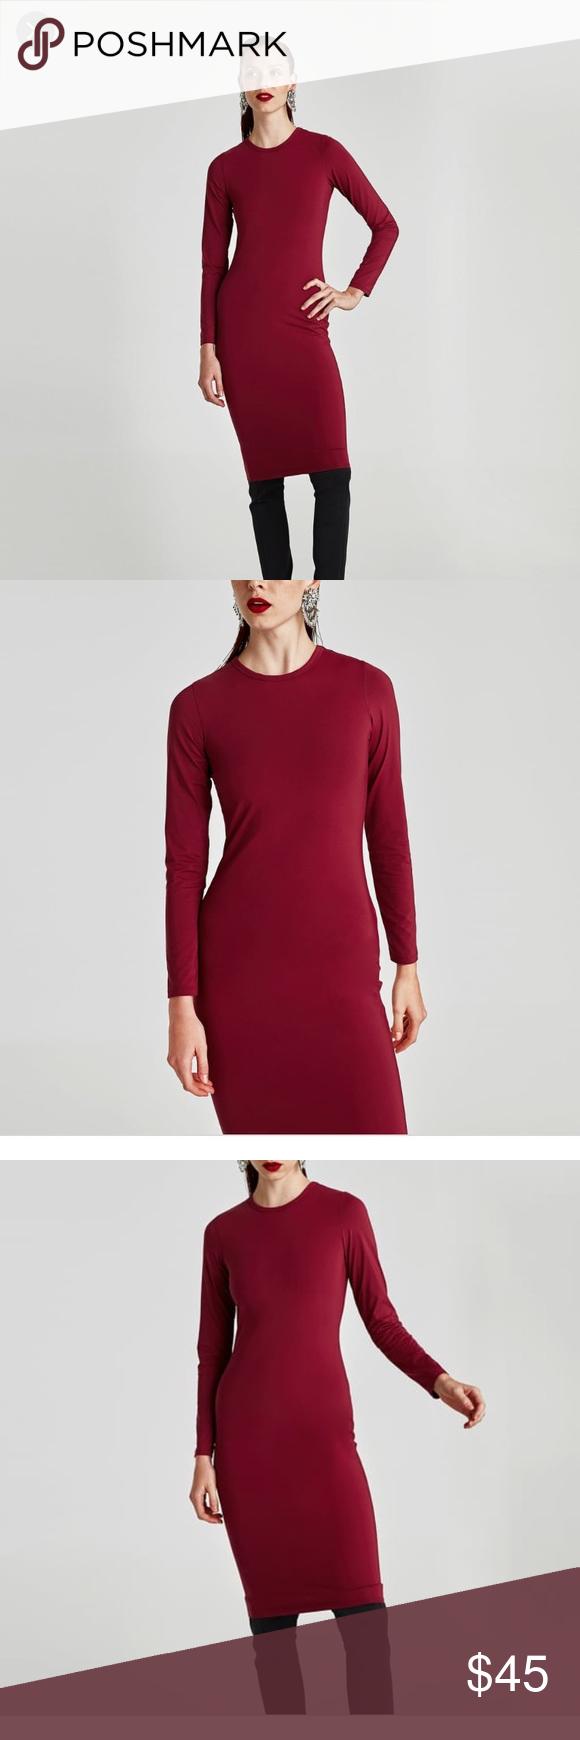 Zara polyamide long sleeve dress in red s nwt nwt my posh picks